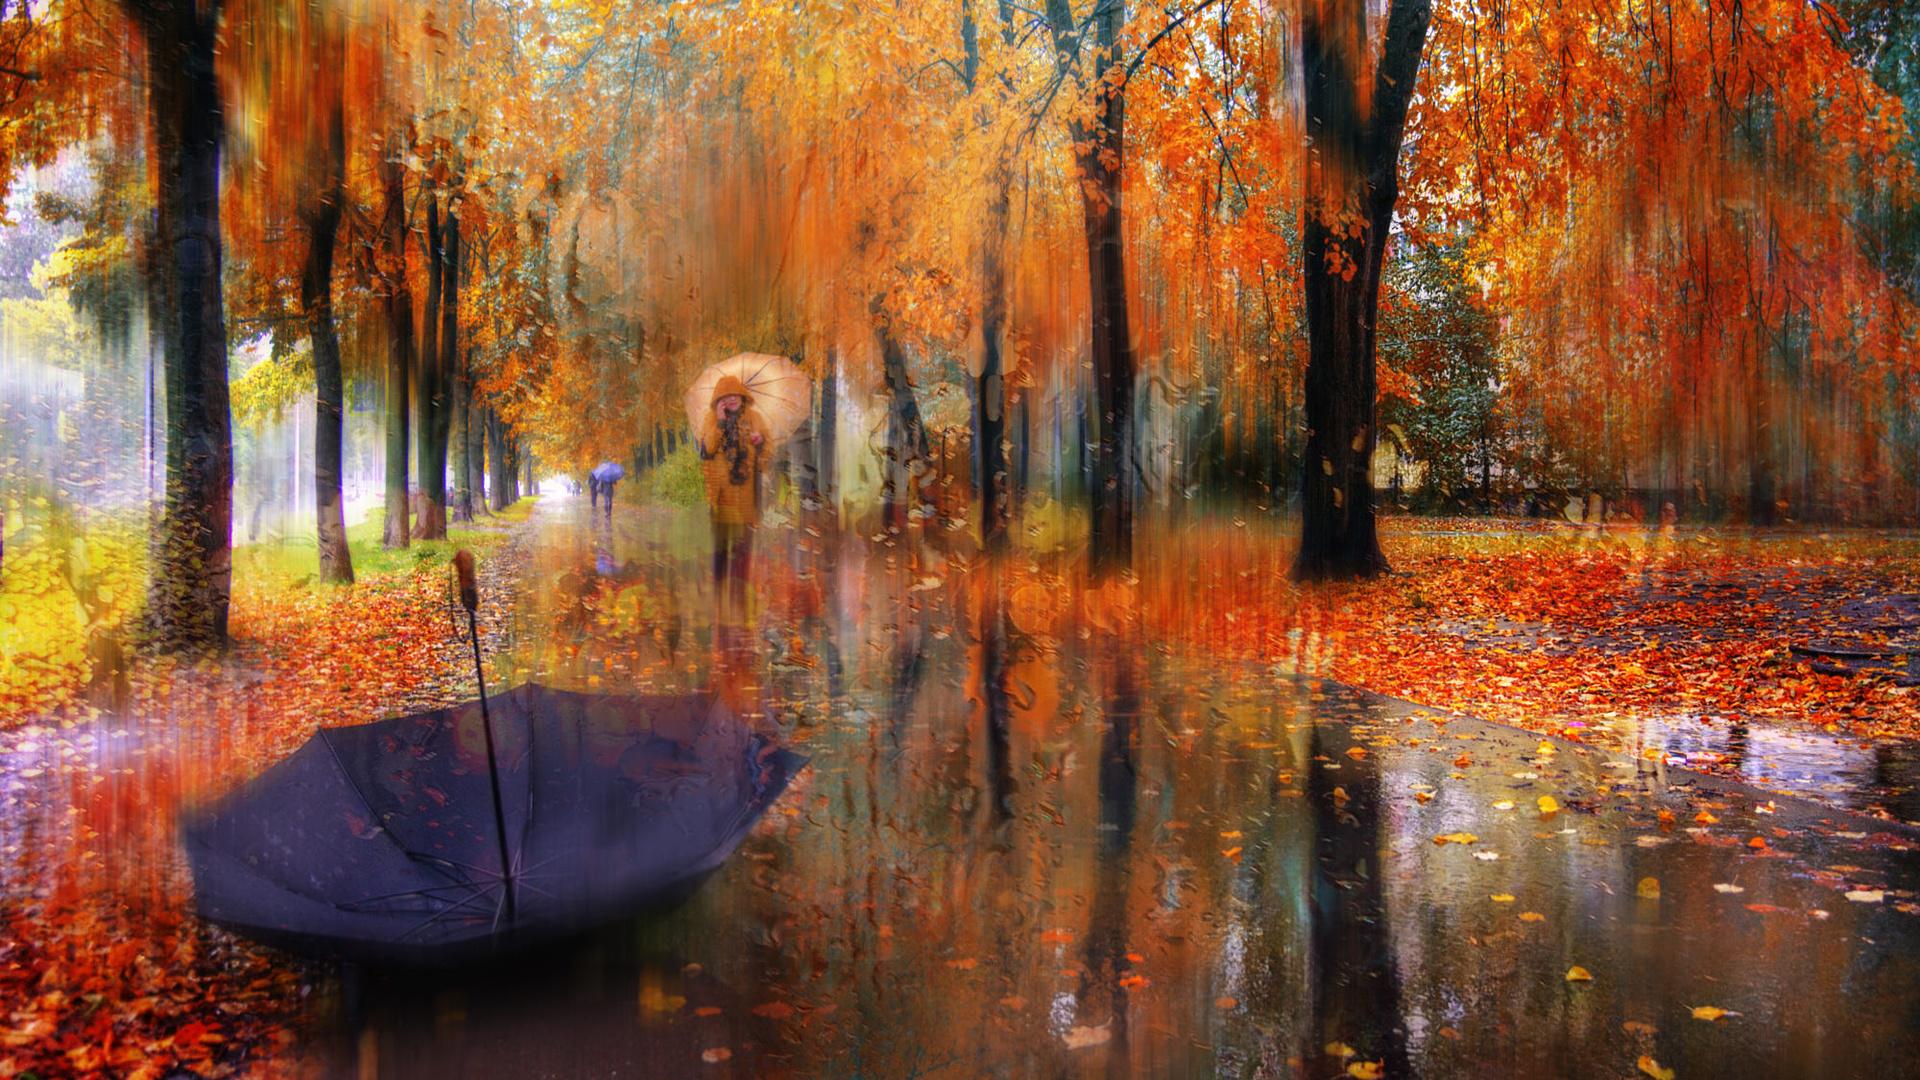 Осенние картинки с дождем, картинки жизни